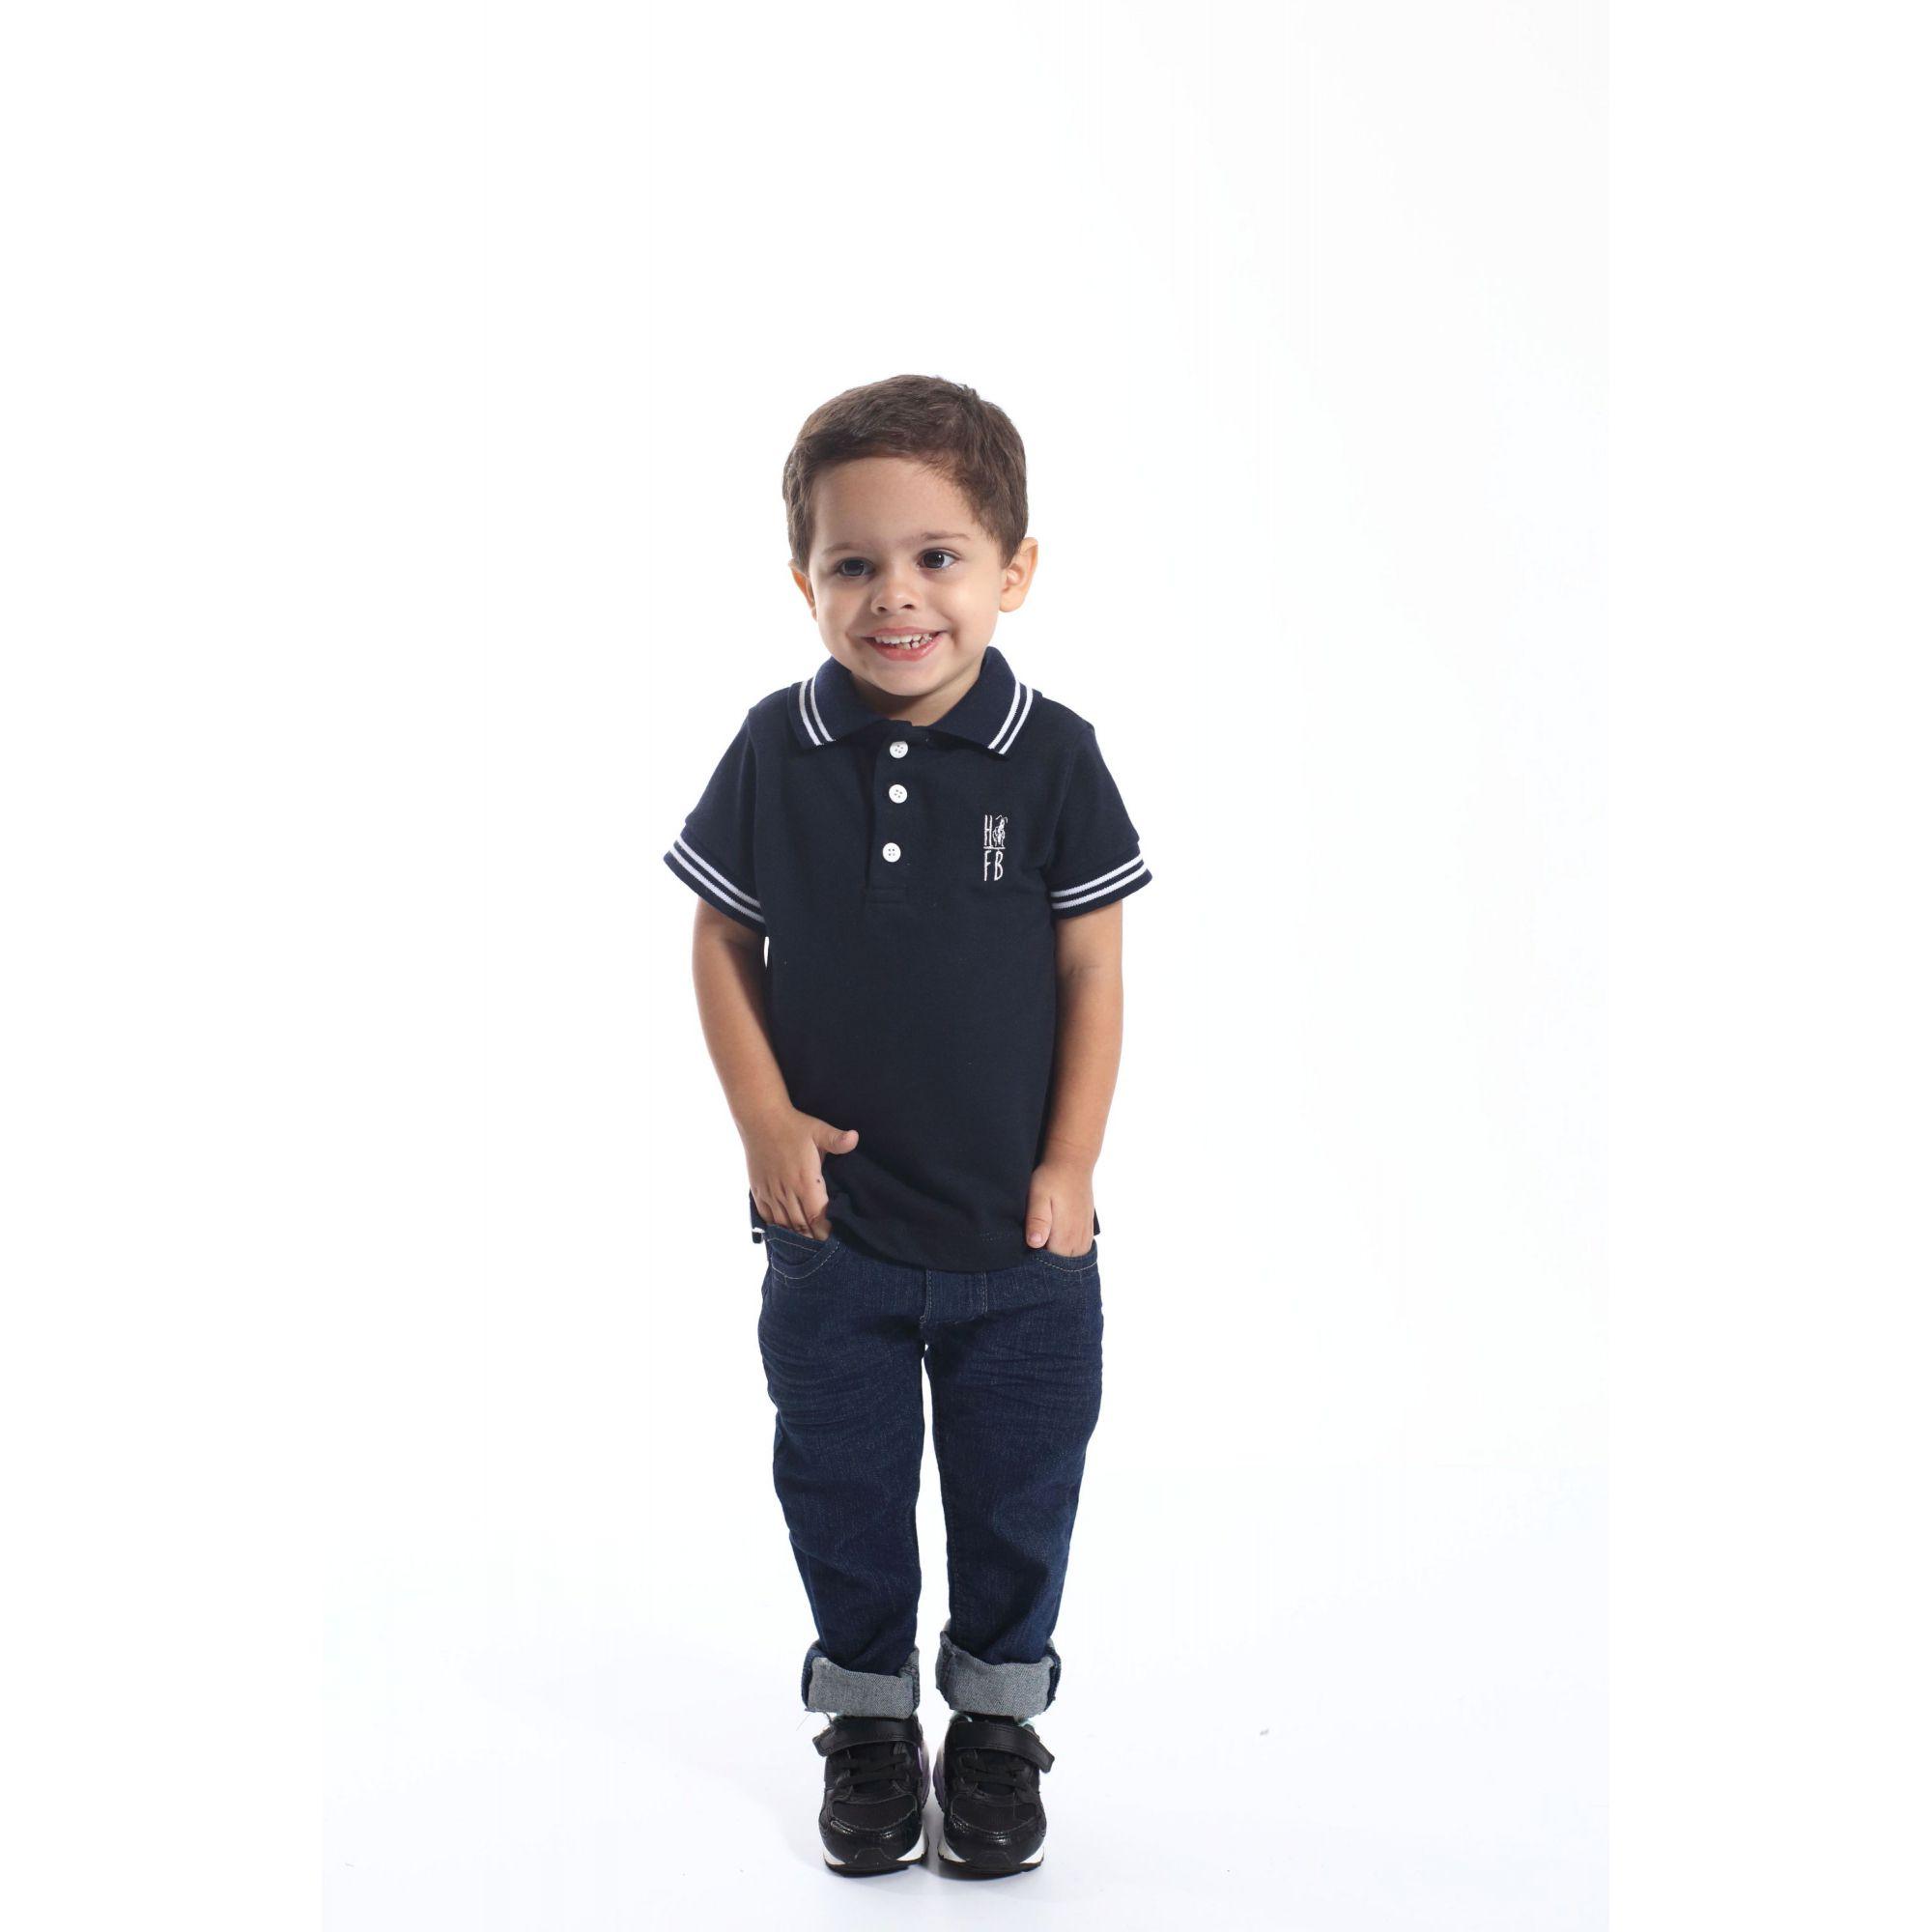 Camisa Polo ou Body Infantil Azul Marinho Céu  - Heitor Fashion Brazil